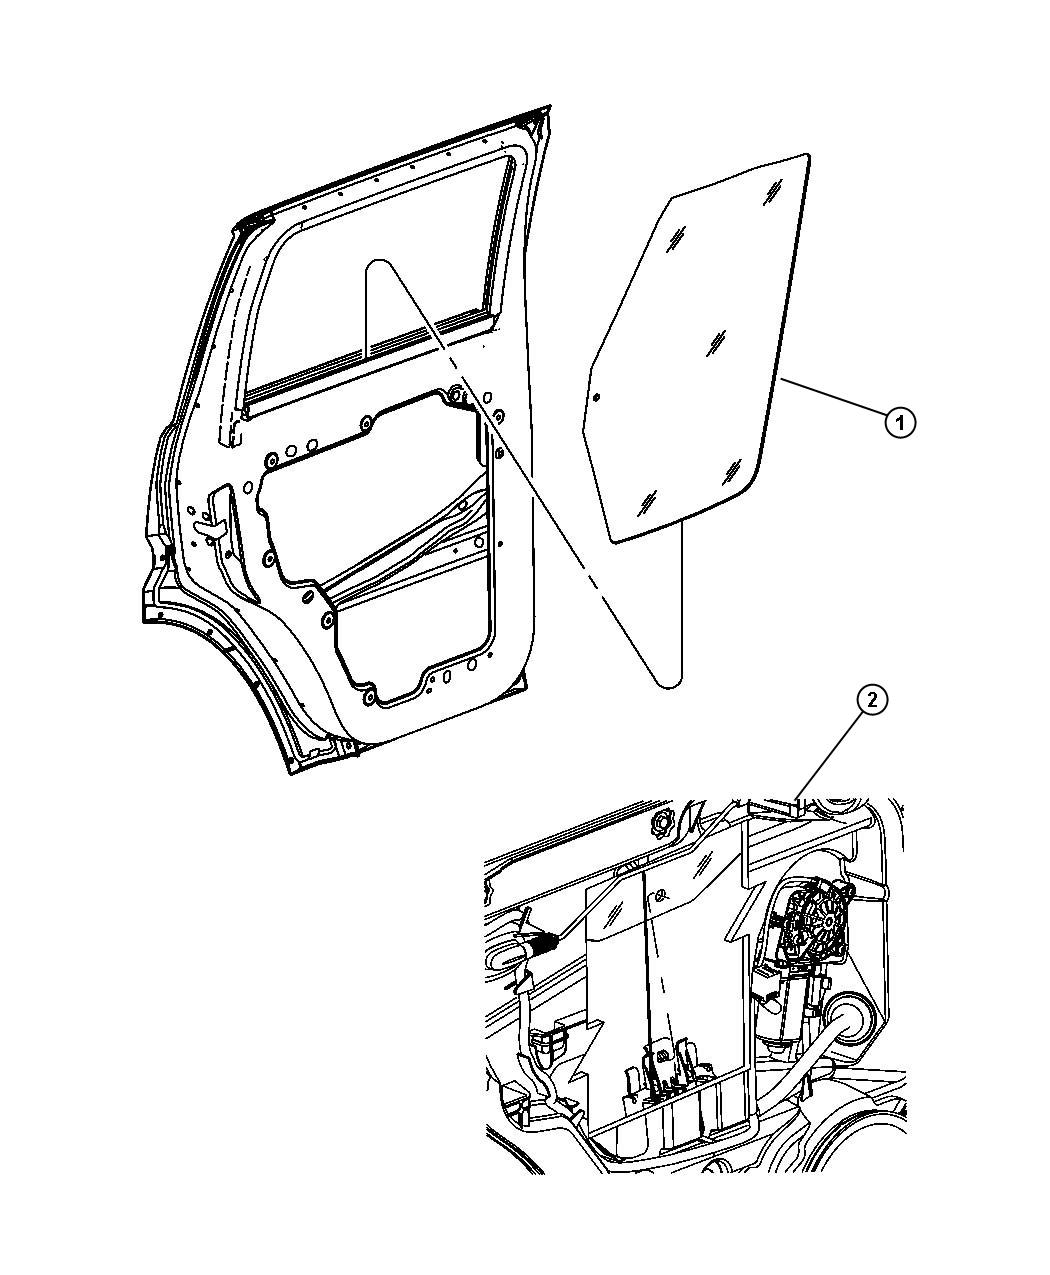 2qf Fuse Box Diagram 2002 Ford F 150 1991 Ford F-150 Fuse